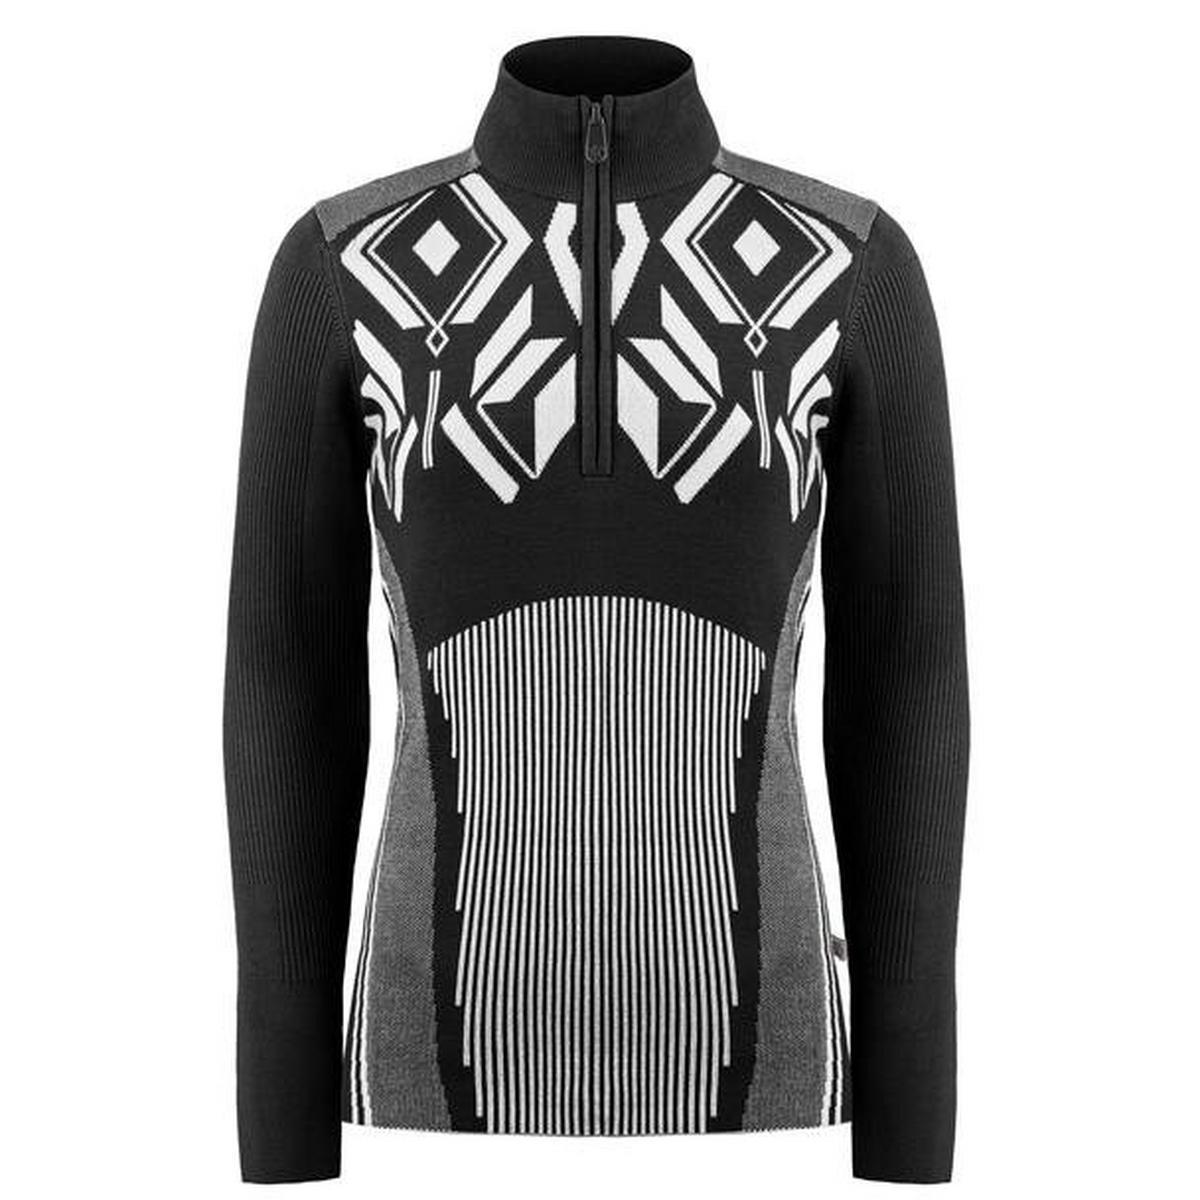 Poivre Blanc Women's Poivre Blanc Knit Sweater - Multi